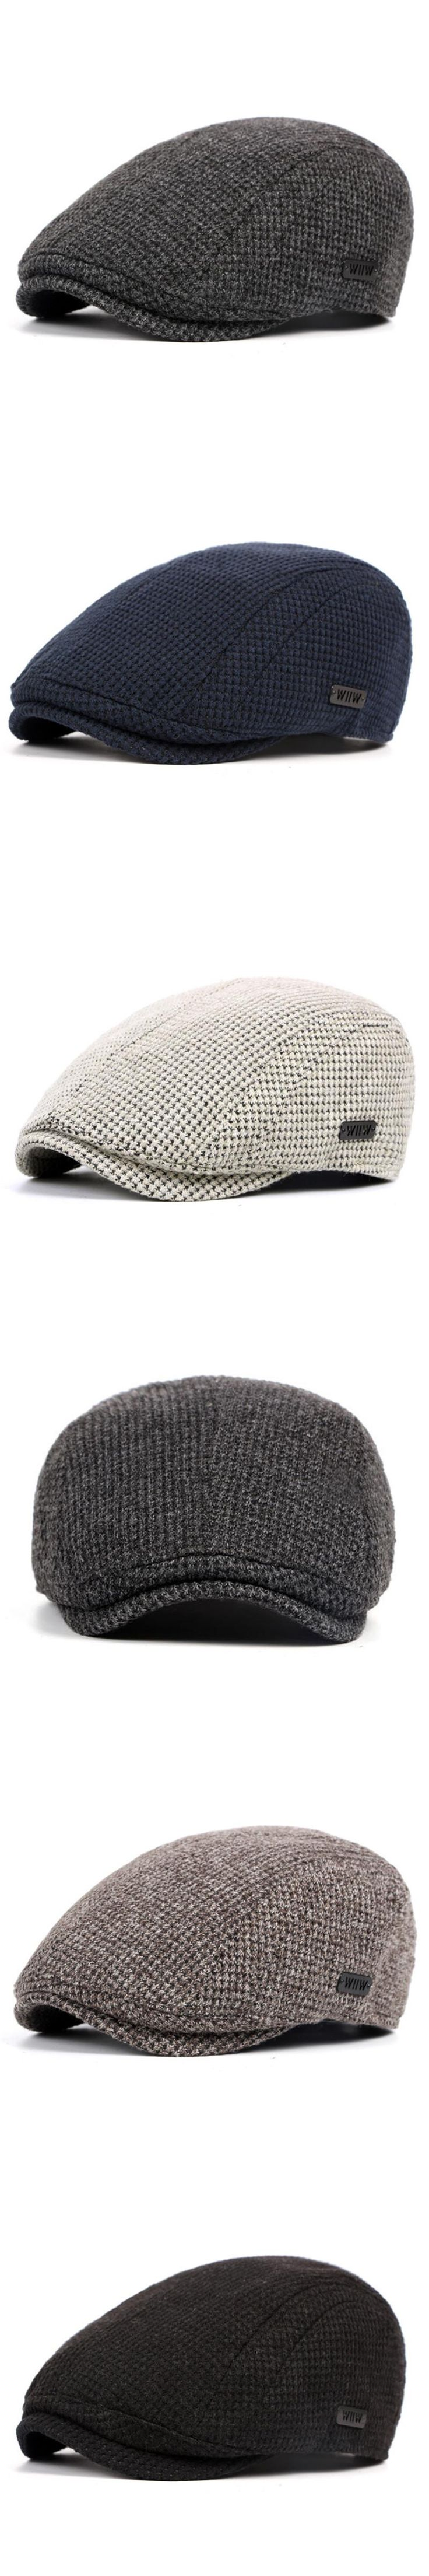 Cotton Knitted Retro Berets Hats For Men 2017 Autumn Adjustable Causal Newsboy Cap Hip Hop Male Golf Flat Hat Boinas Hombre